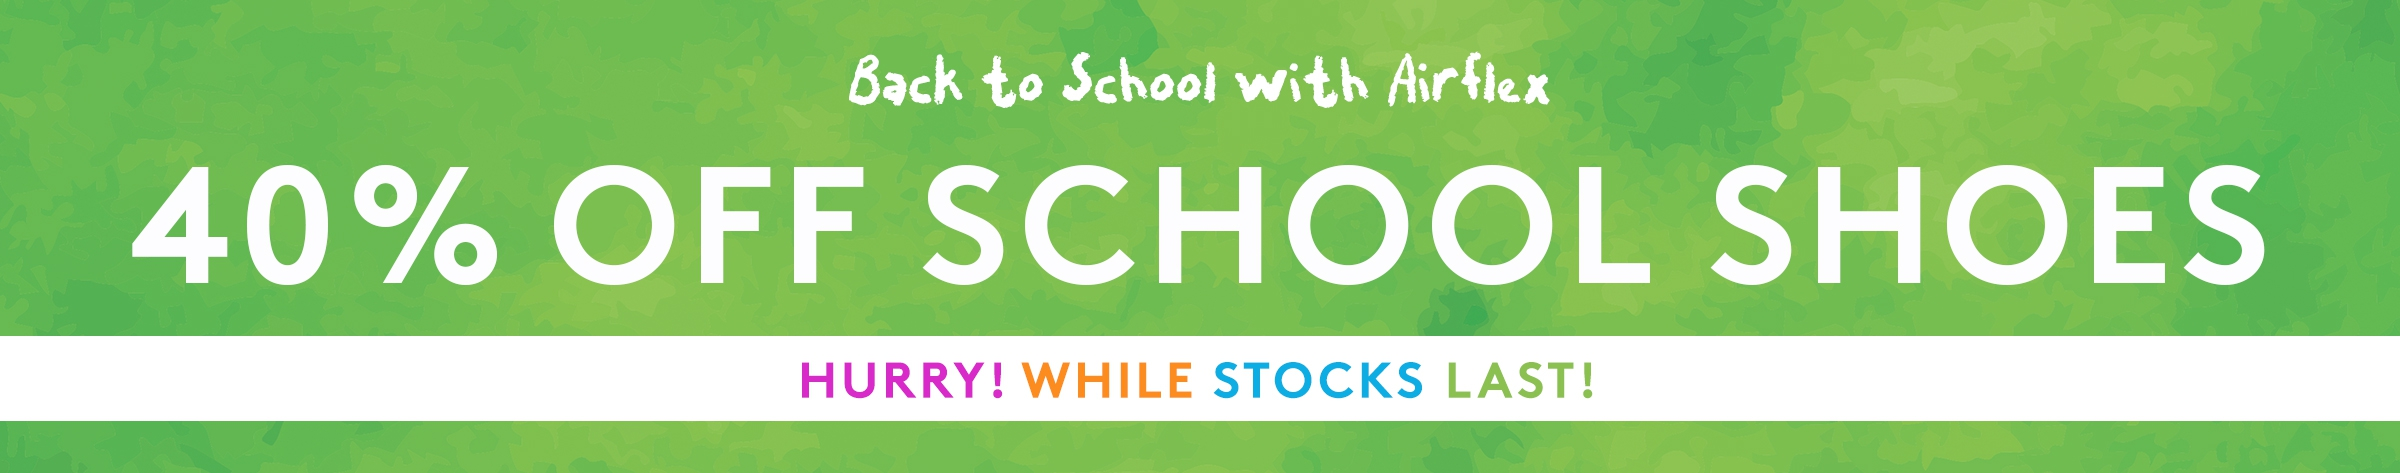 40% Off School Shoes